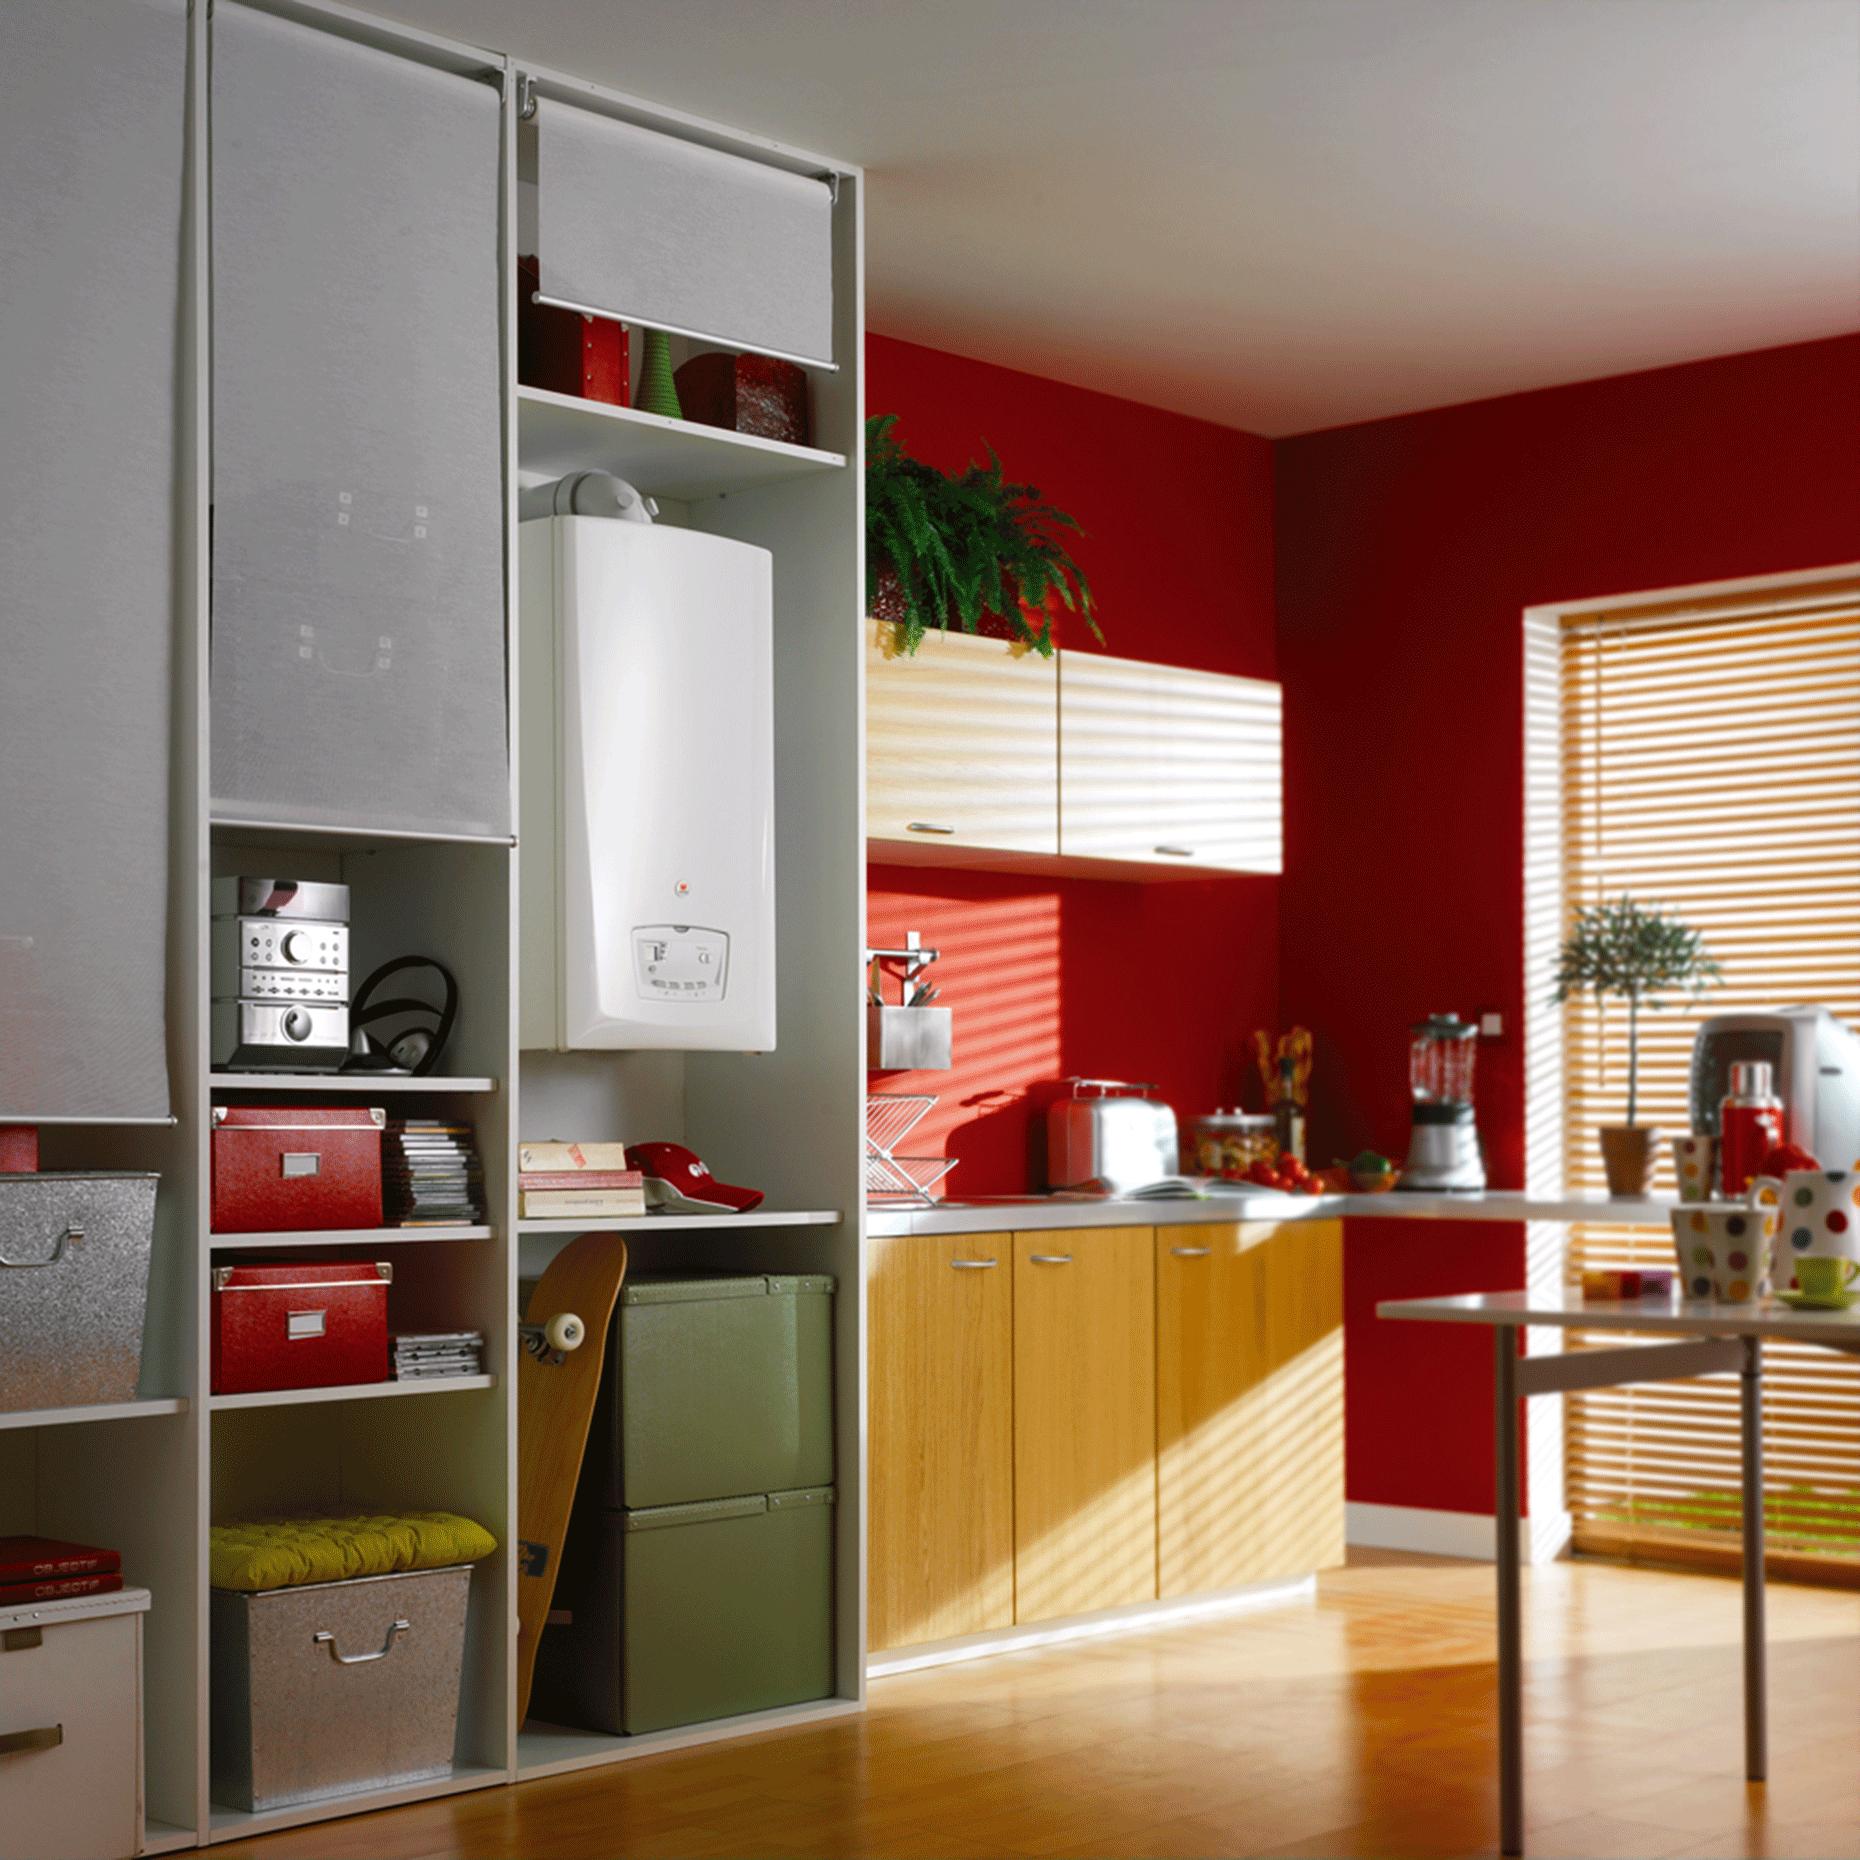 thema as saunier duval sp cialiste expert et. Black Bedroom Furniture Sets. Home Design Ideas